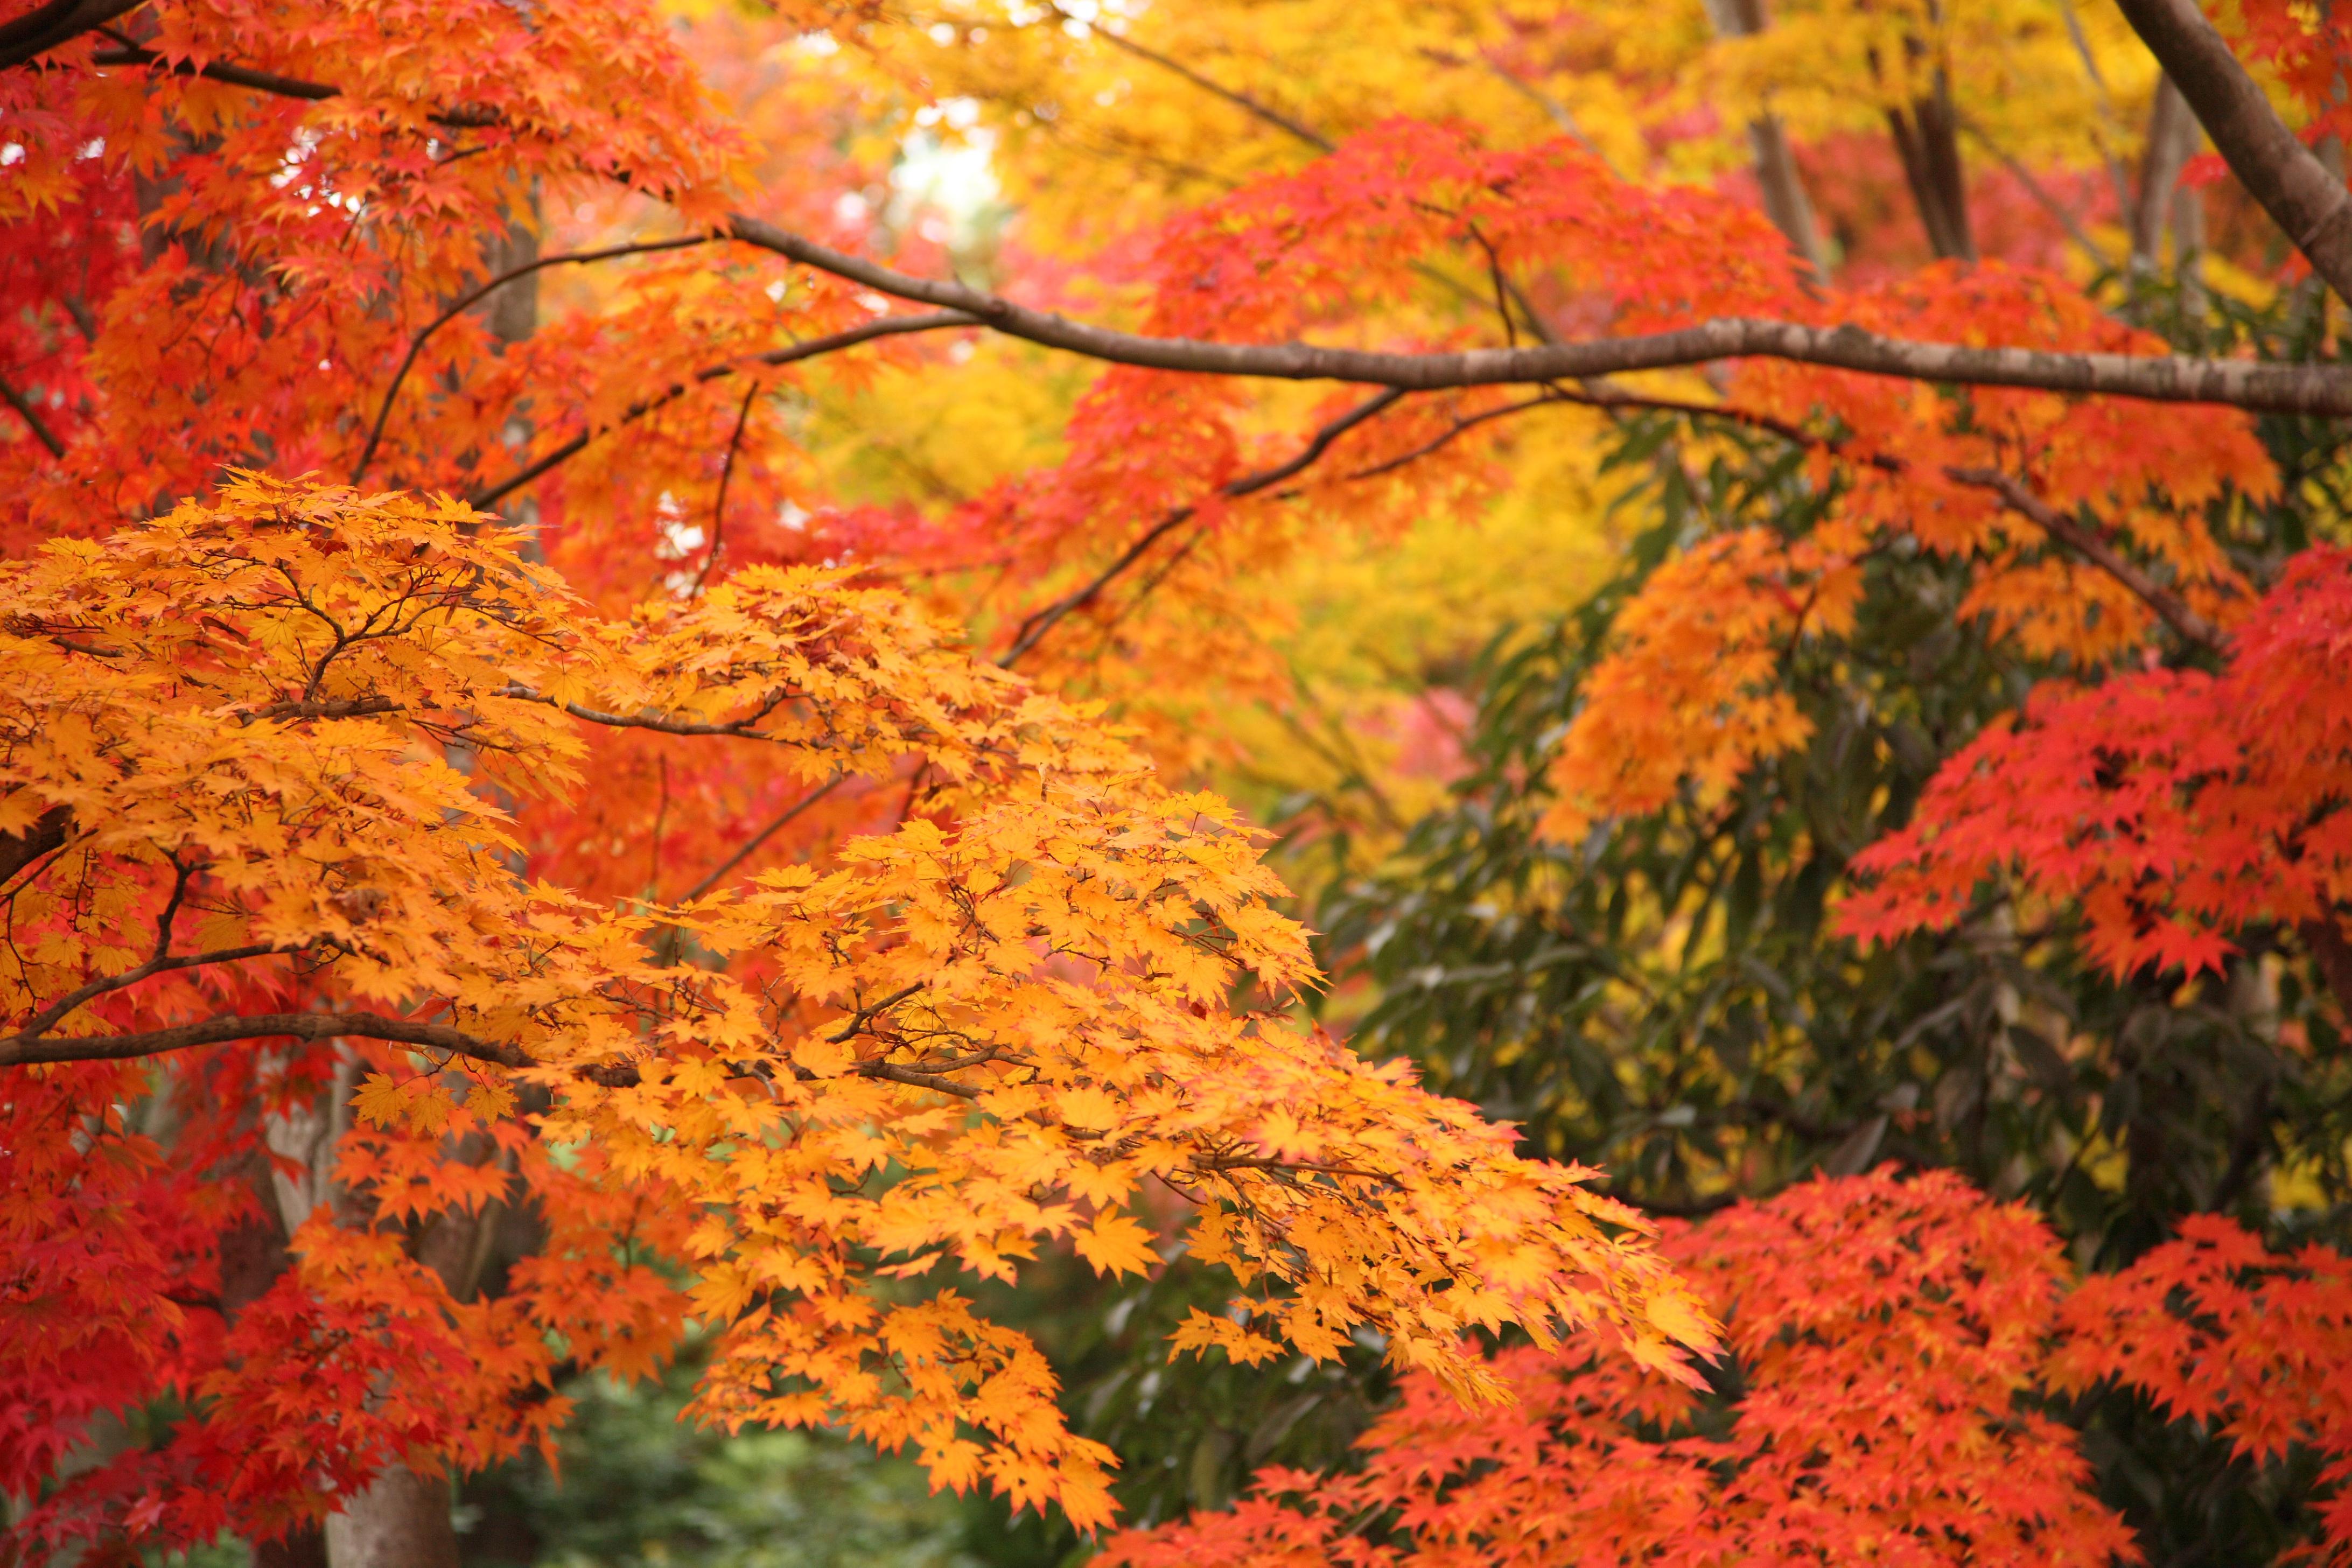 File:Colorful Leaves in Showa Kinen Park.jpg - Wikimedia Commons